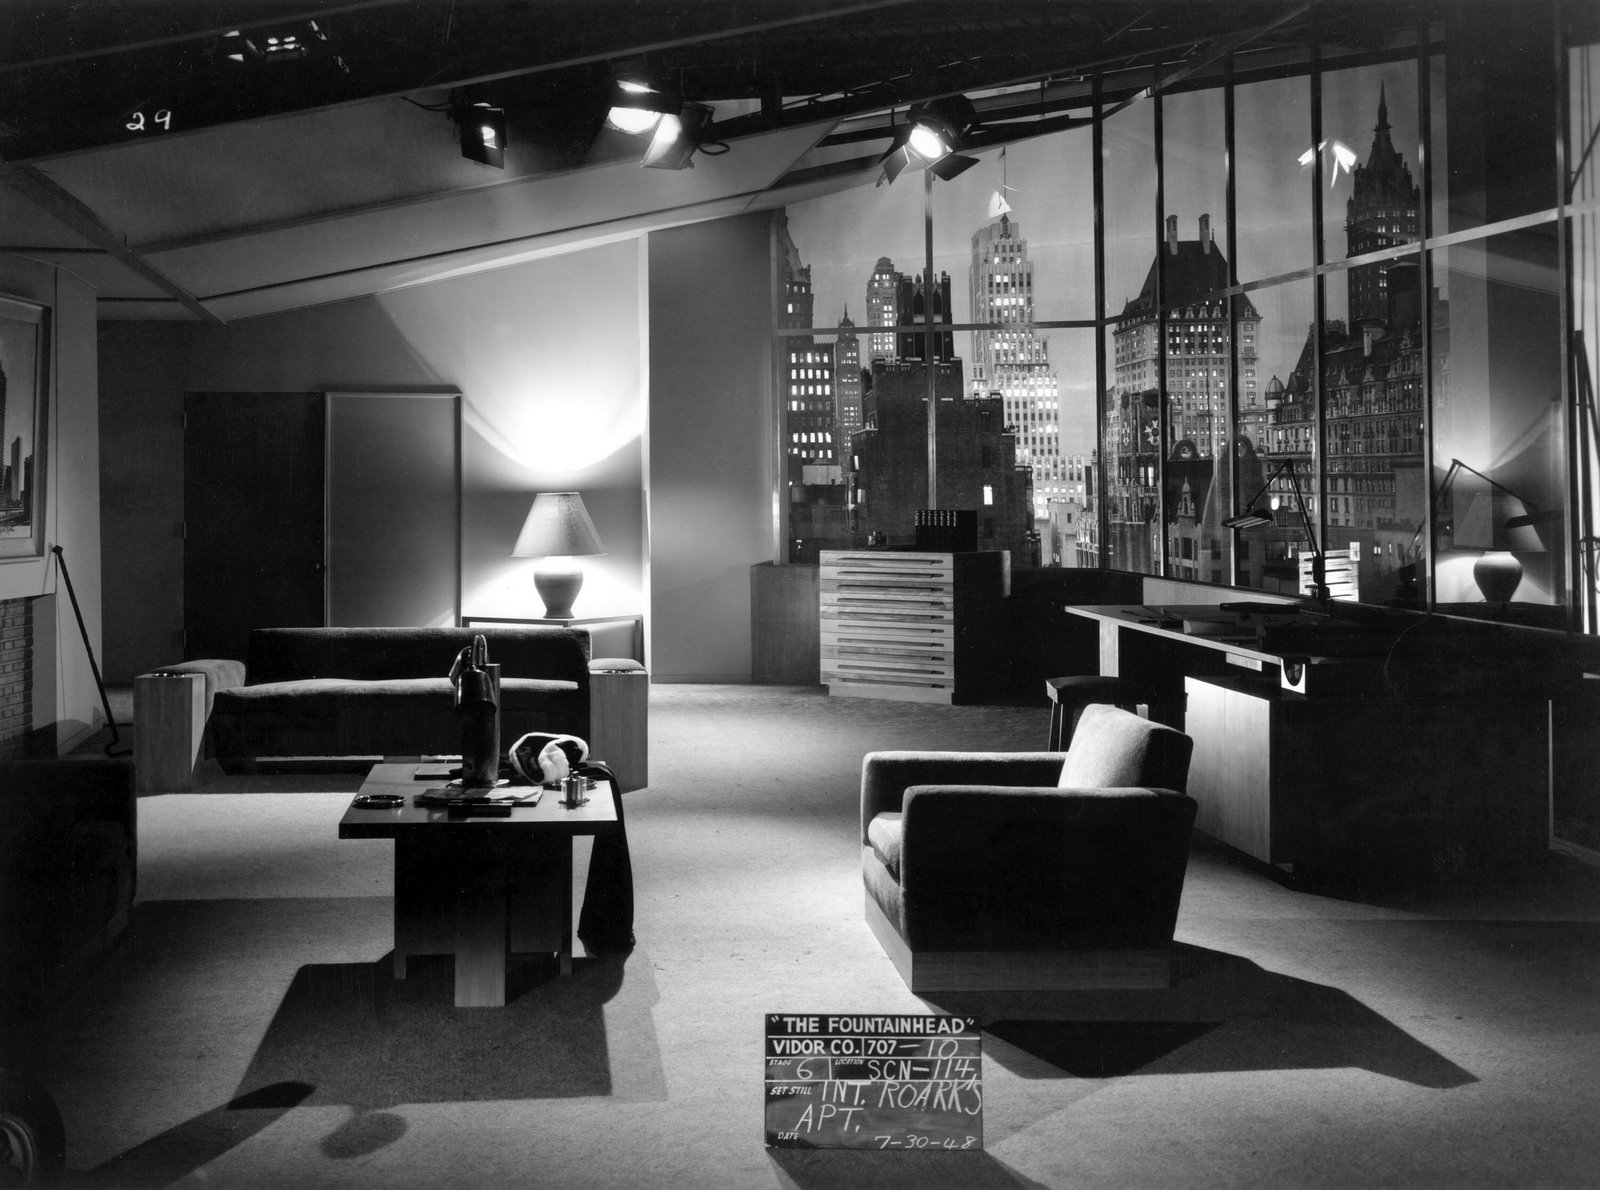 Eventized A Michael Neno Blog The Fountainhead Set Design